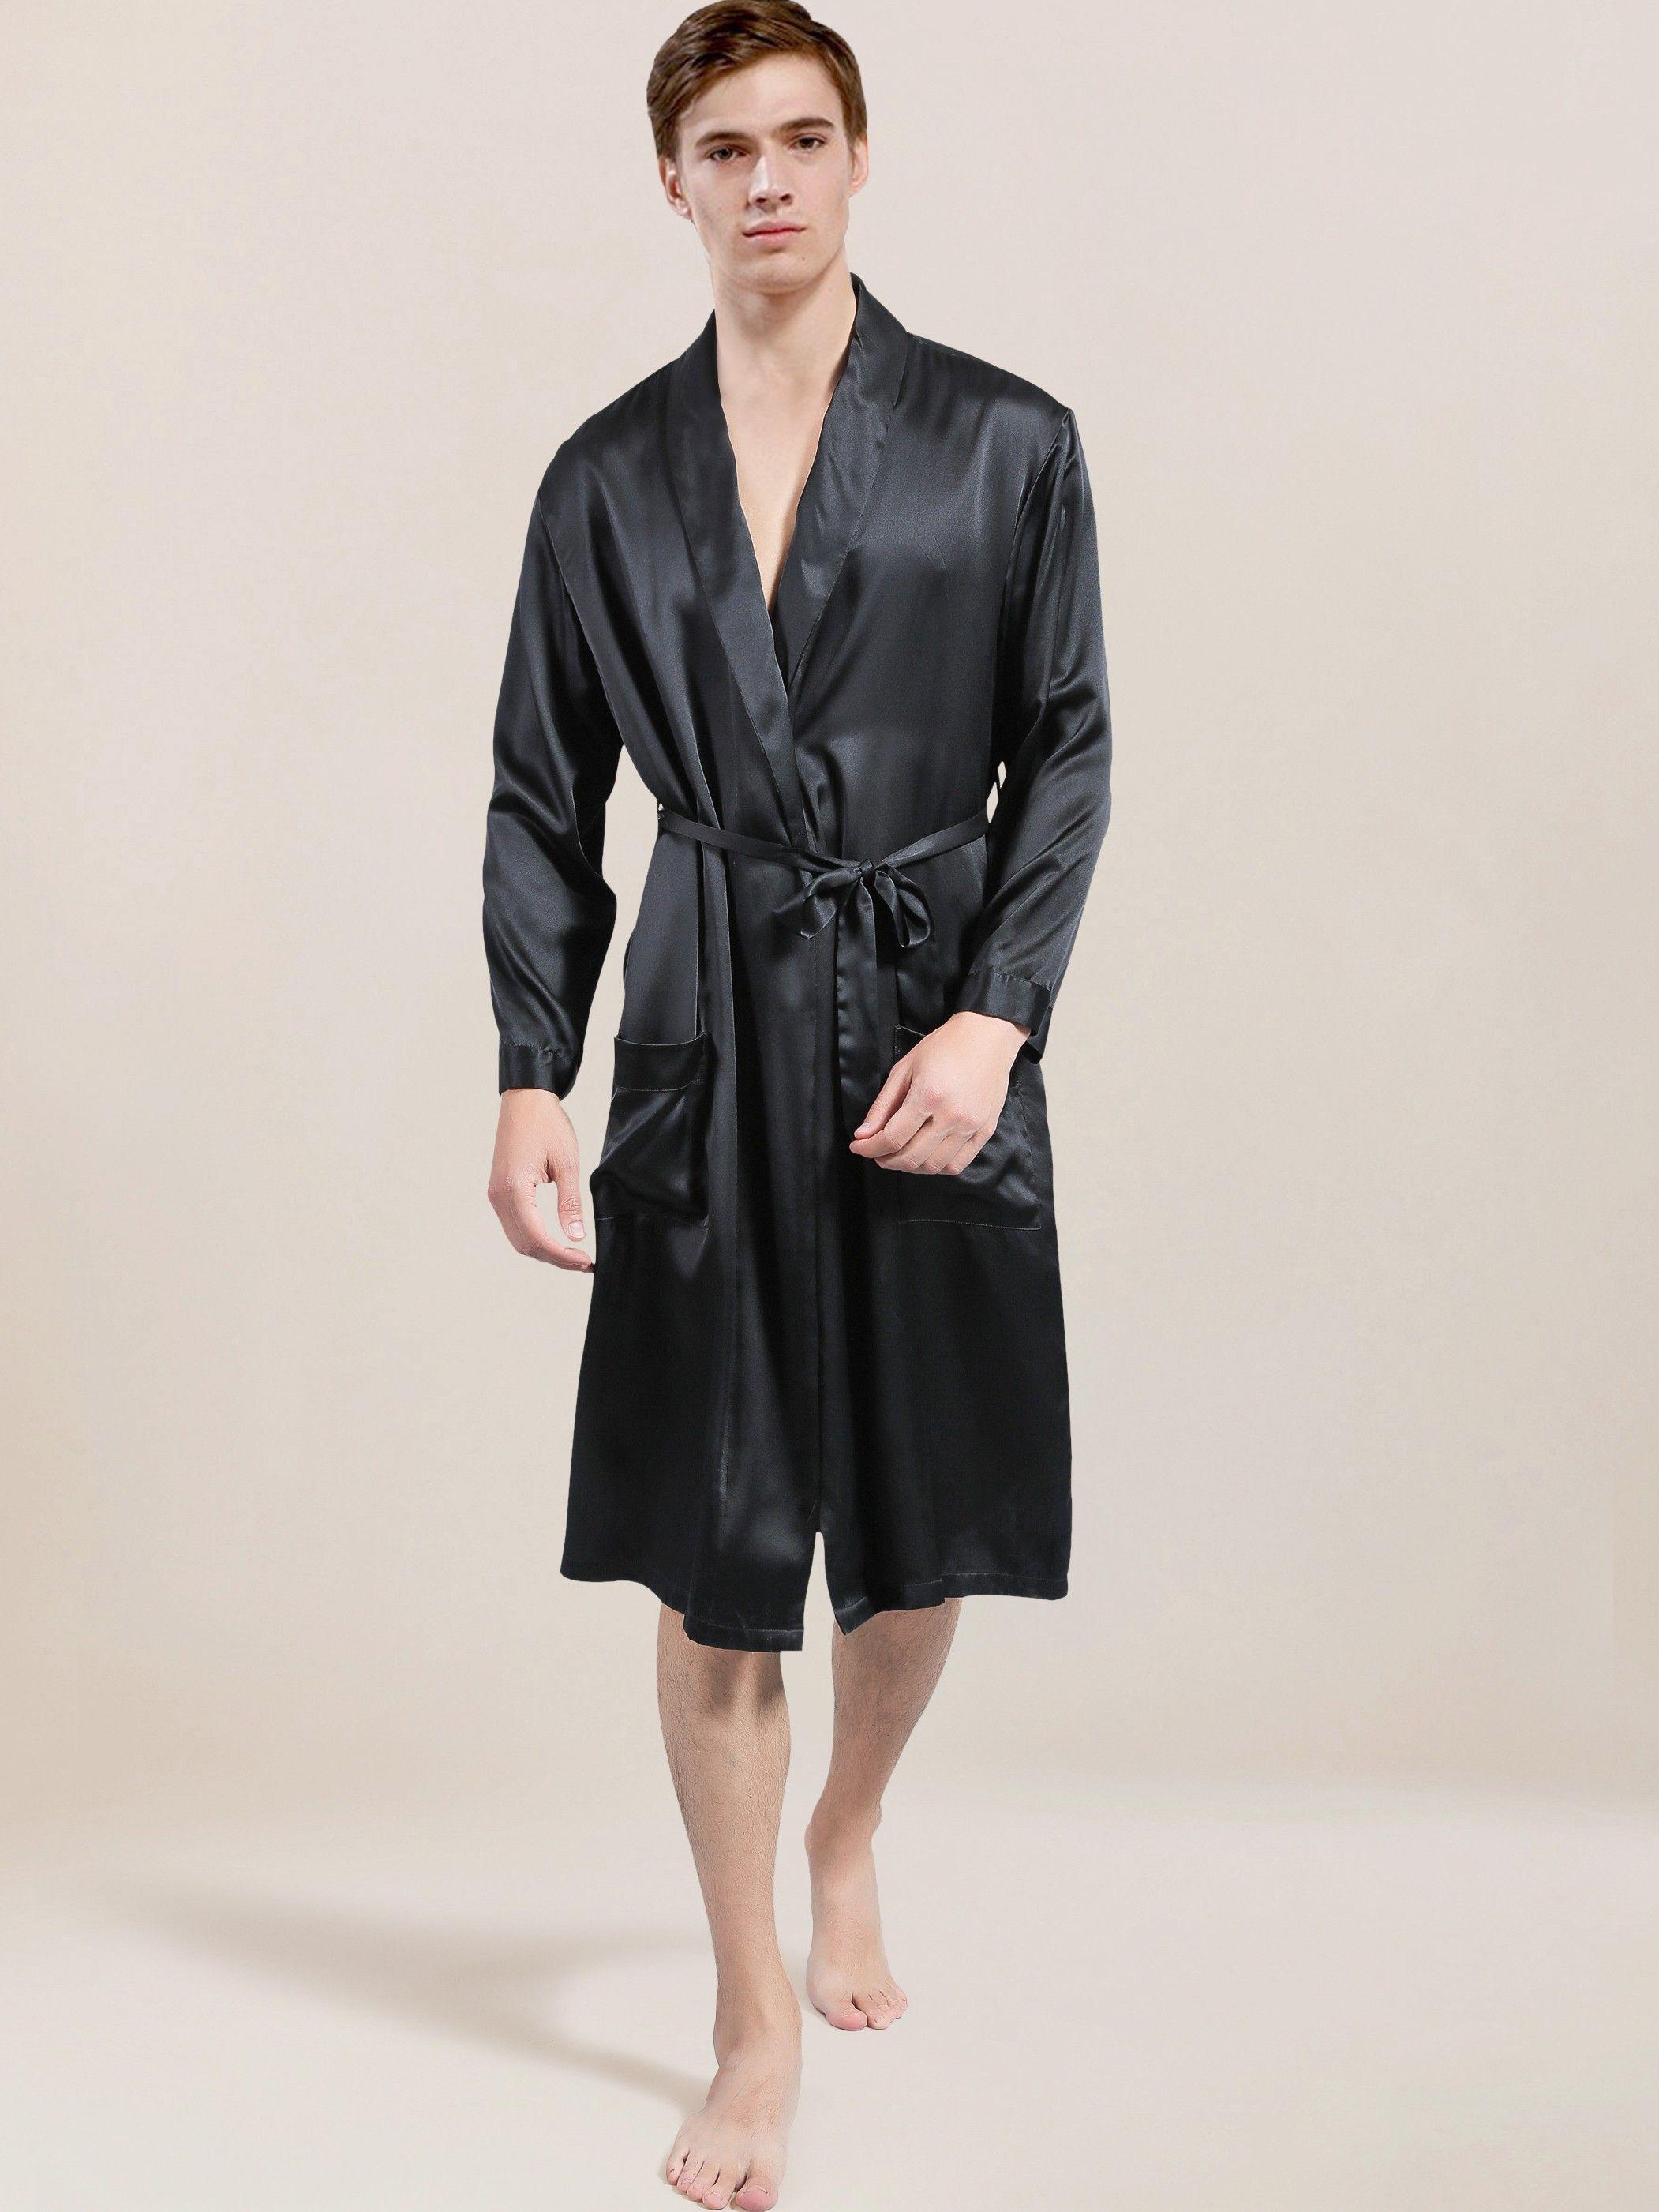 c5f3145b61 Mulberry Silk Robe for Men  silkrobesnightwear